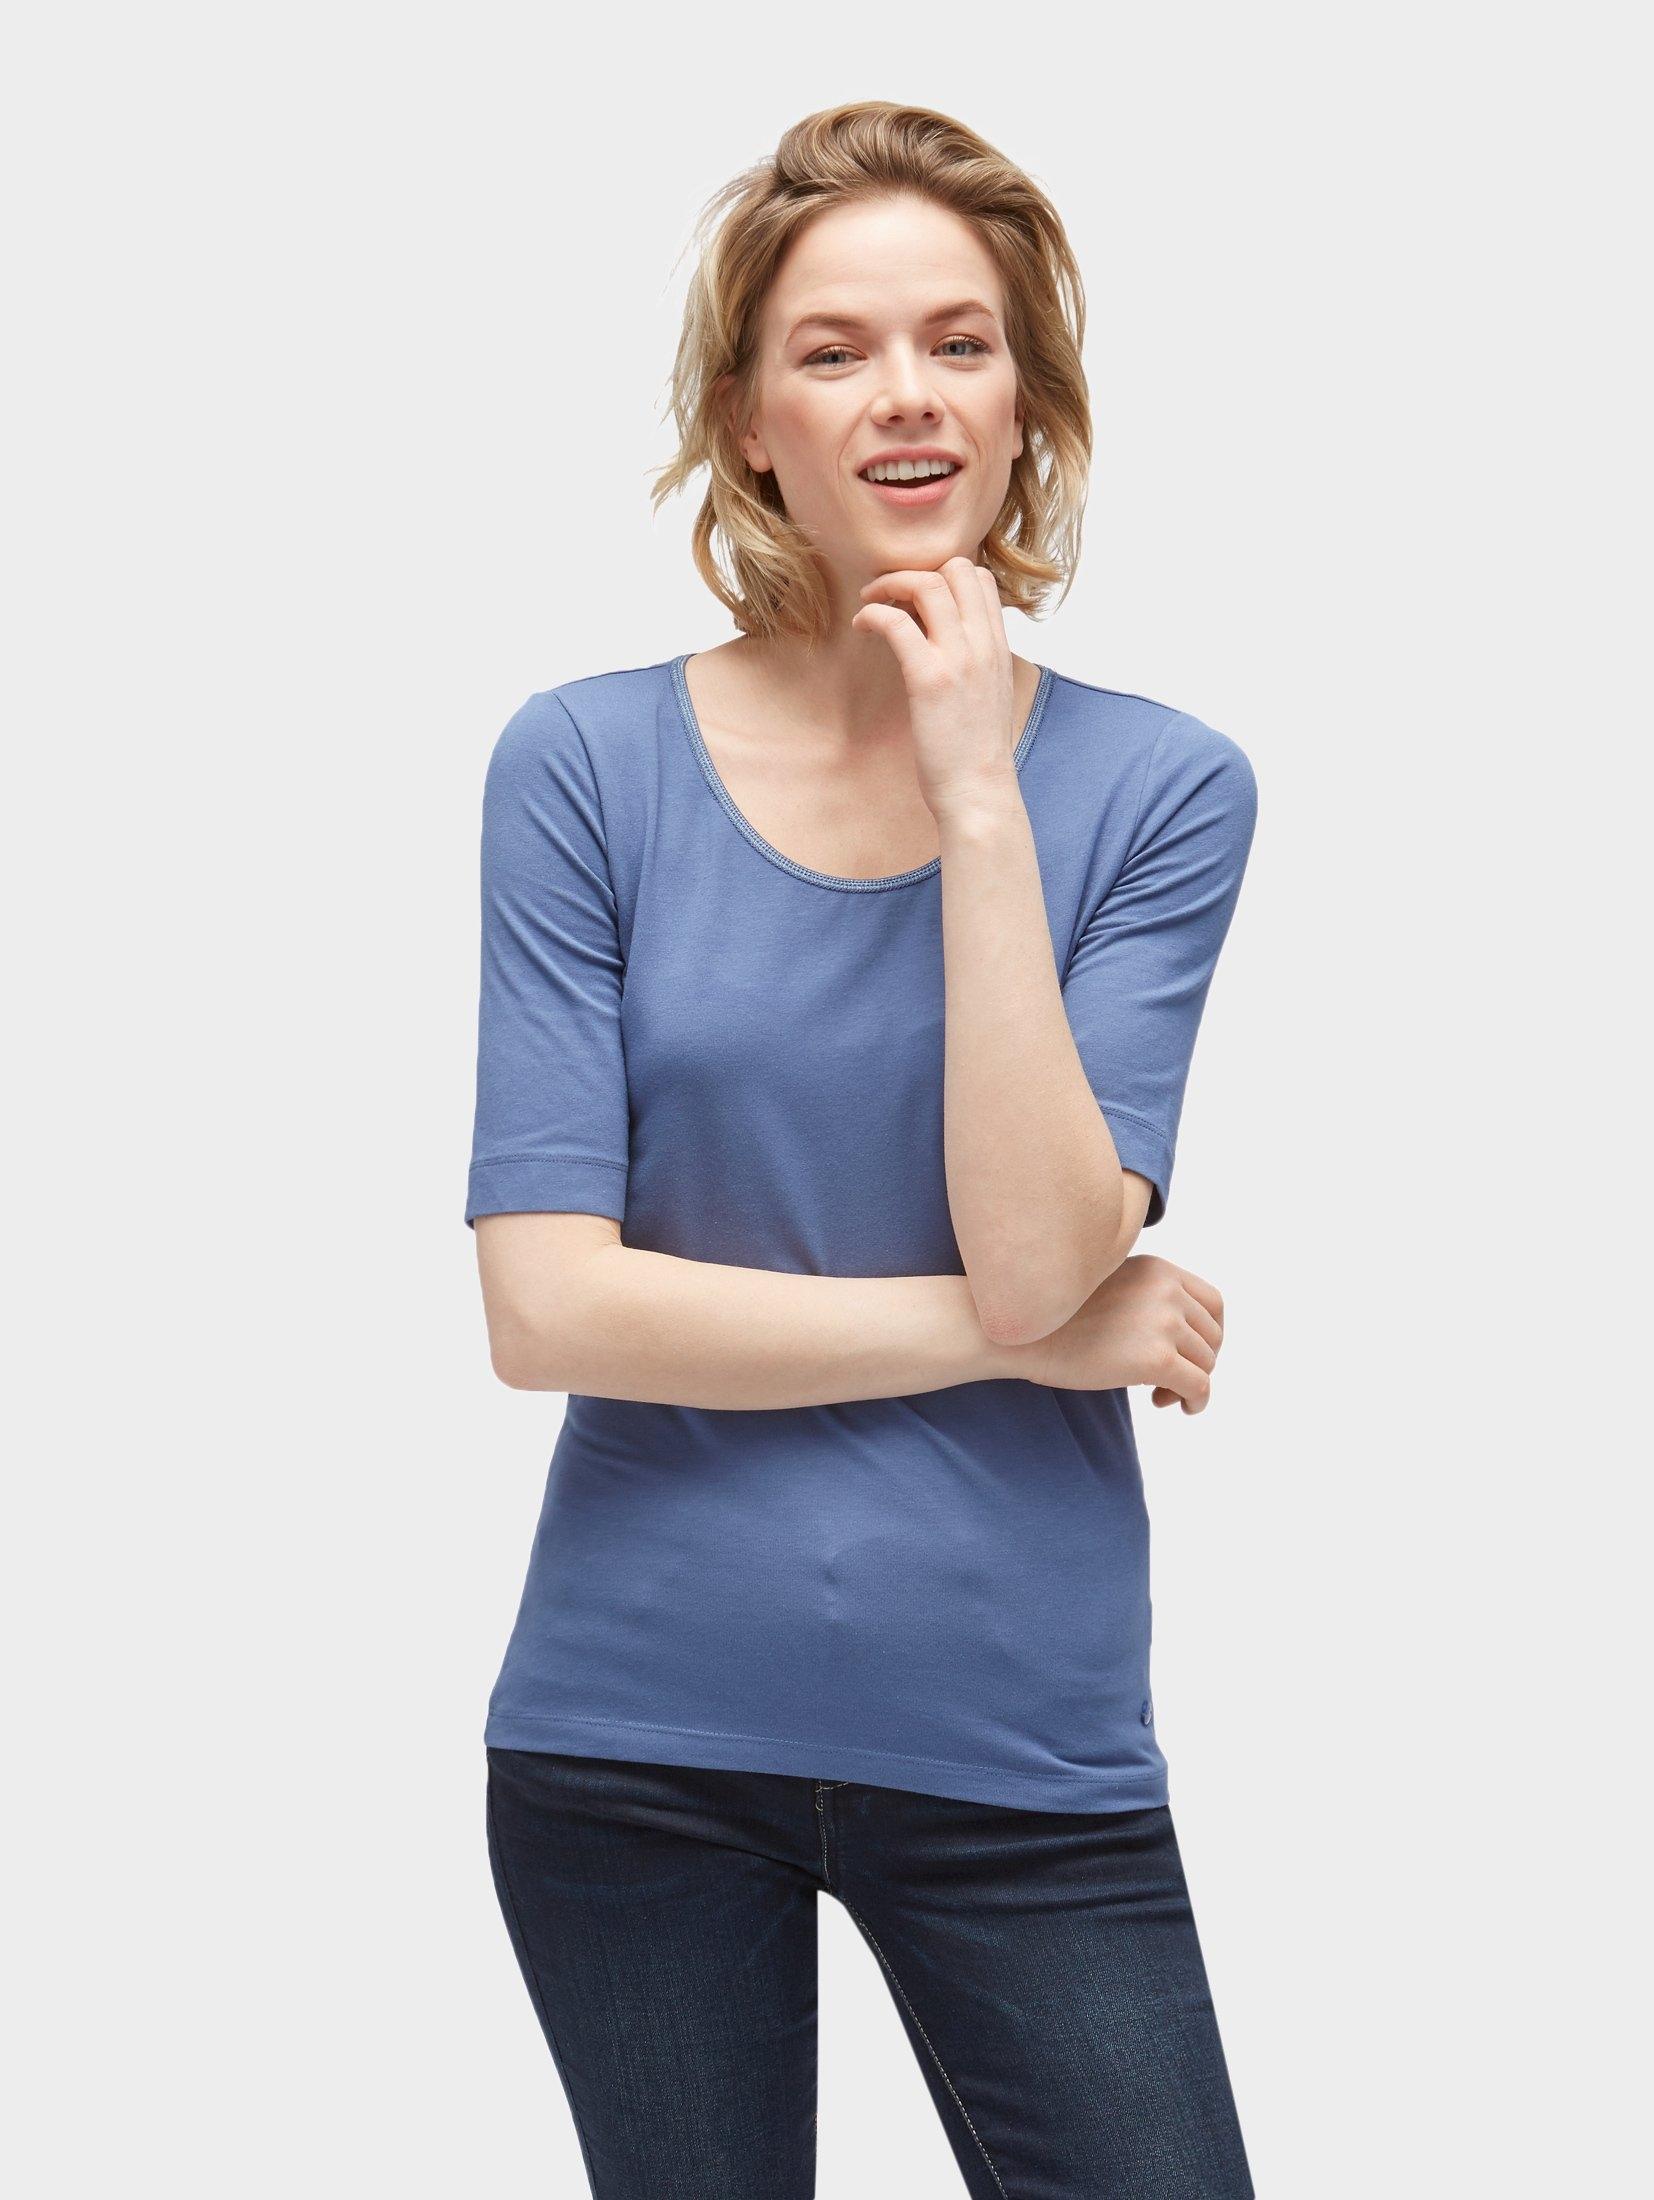 Gevonden Snel Tailor shirtbasic T T shirt Tom J1FlcTK